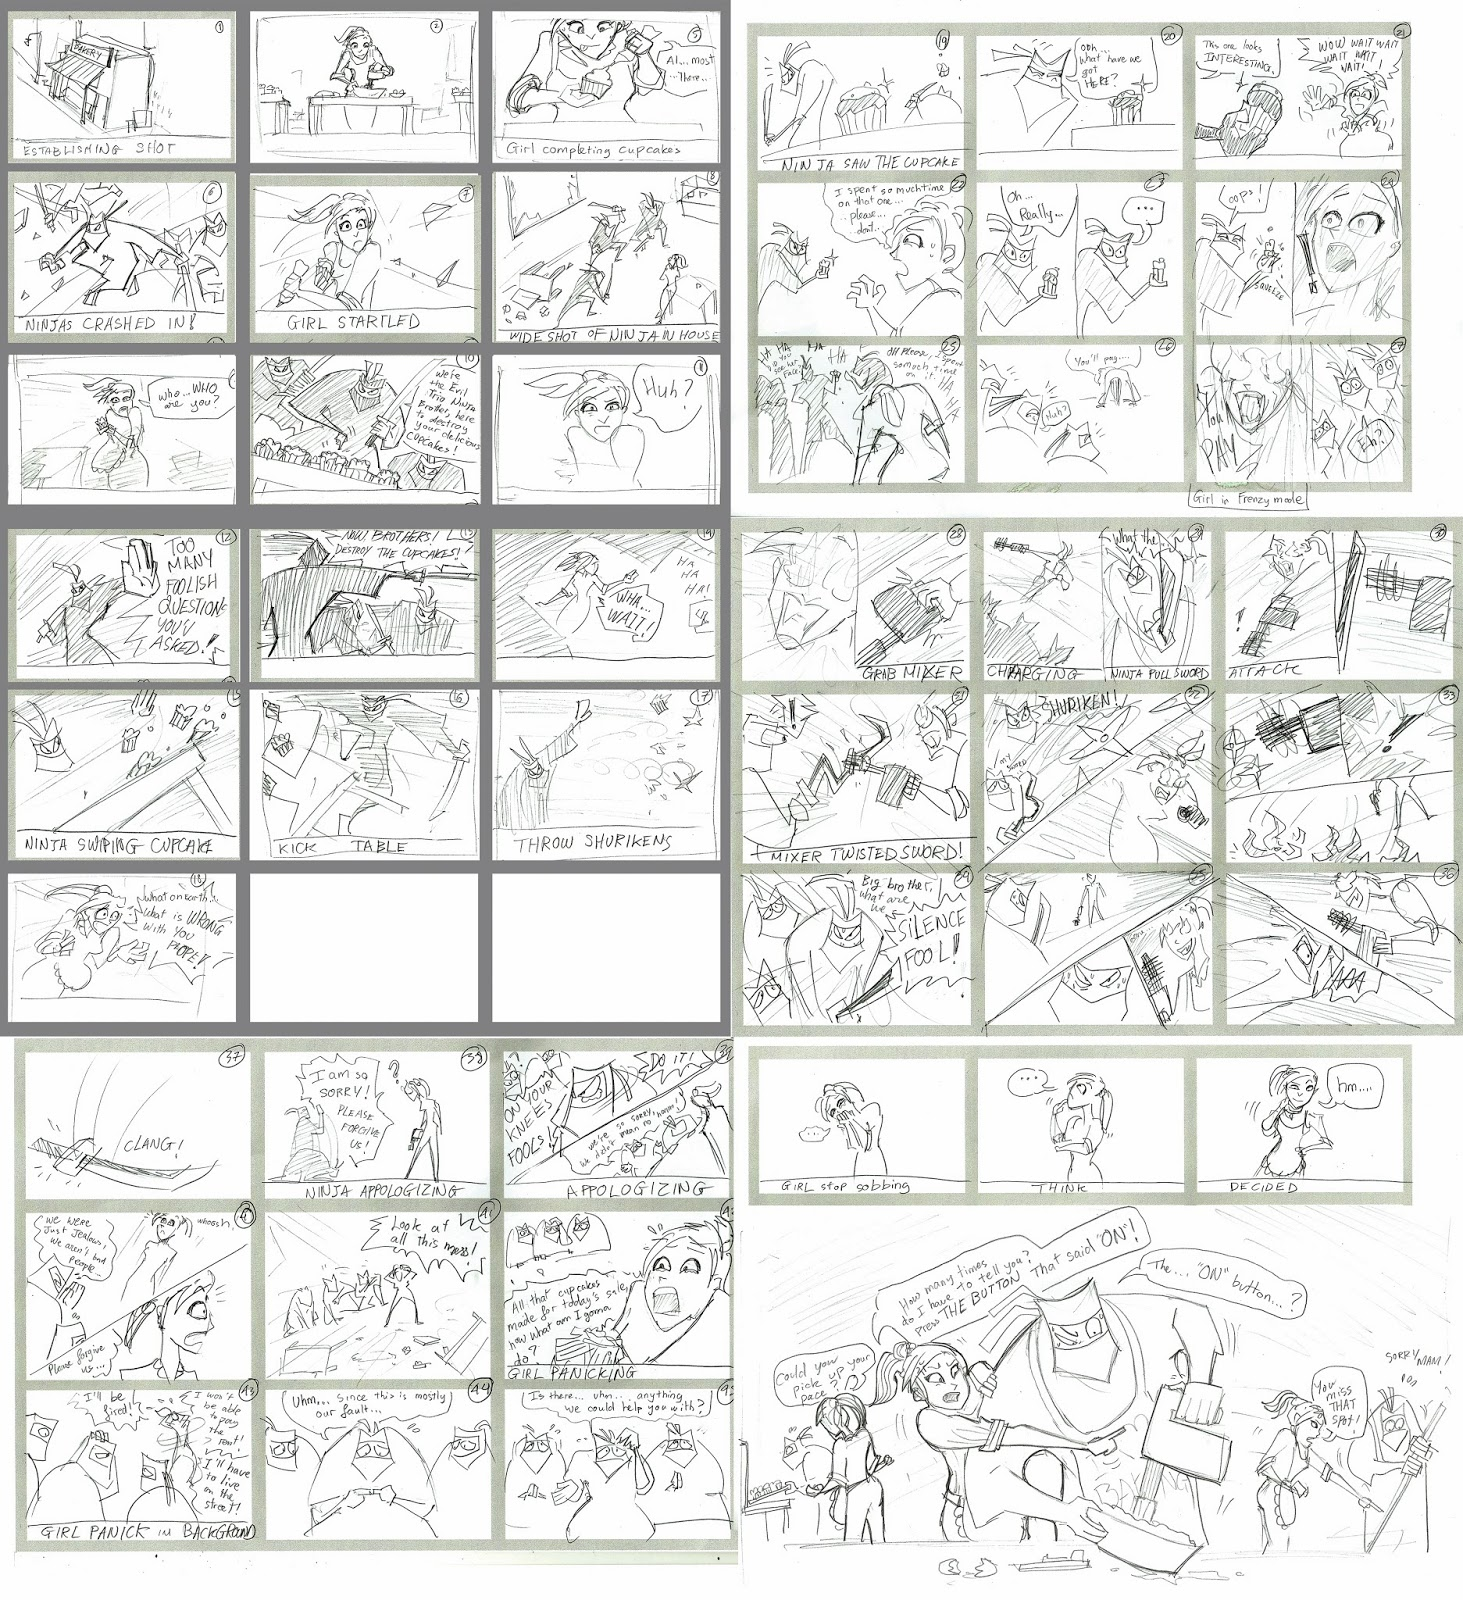 incroyable PANASONIC - CAMPUS Magazine comic / Storyboard